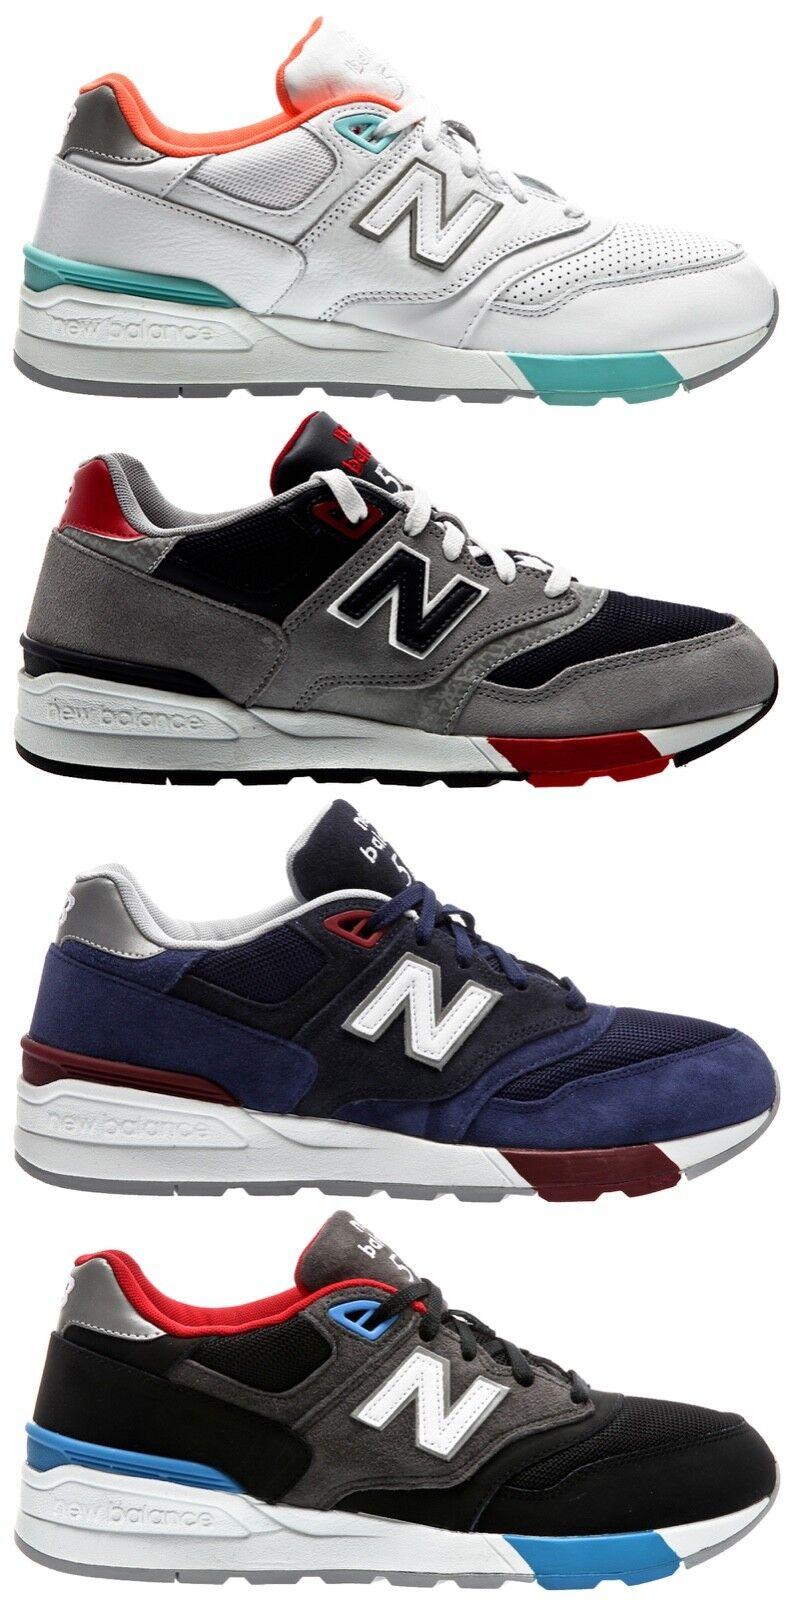 New Balance ML597 Ml 597 Vac NGT Gnb Aab Men Sneaker Mens shoes